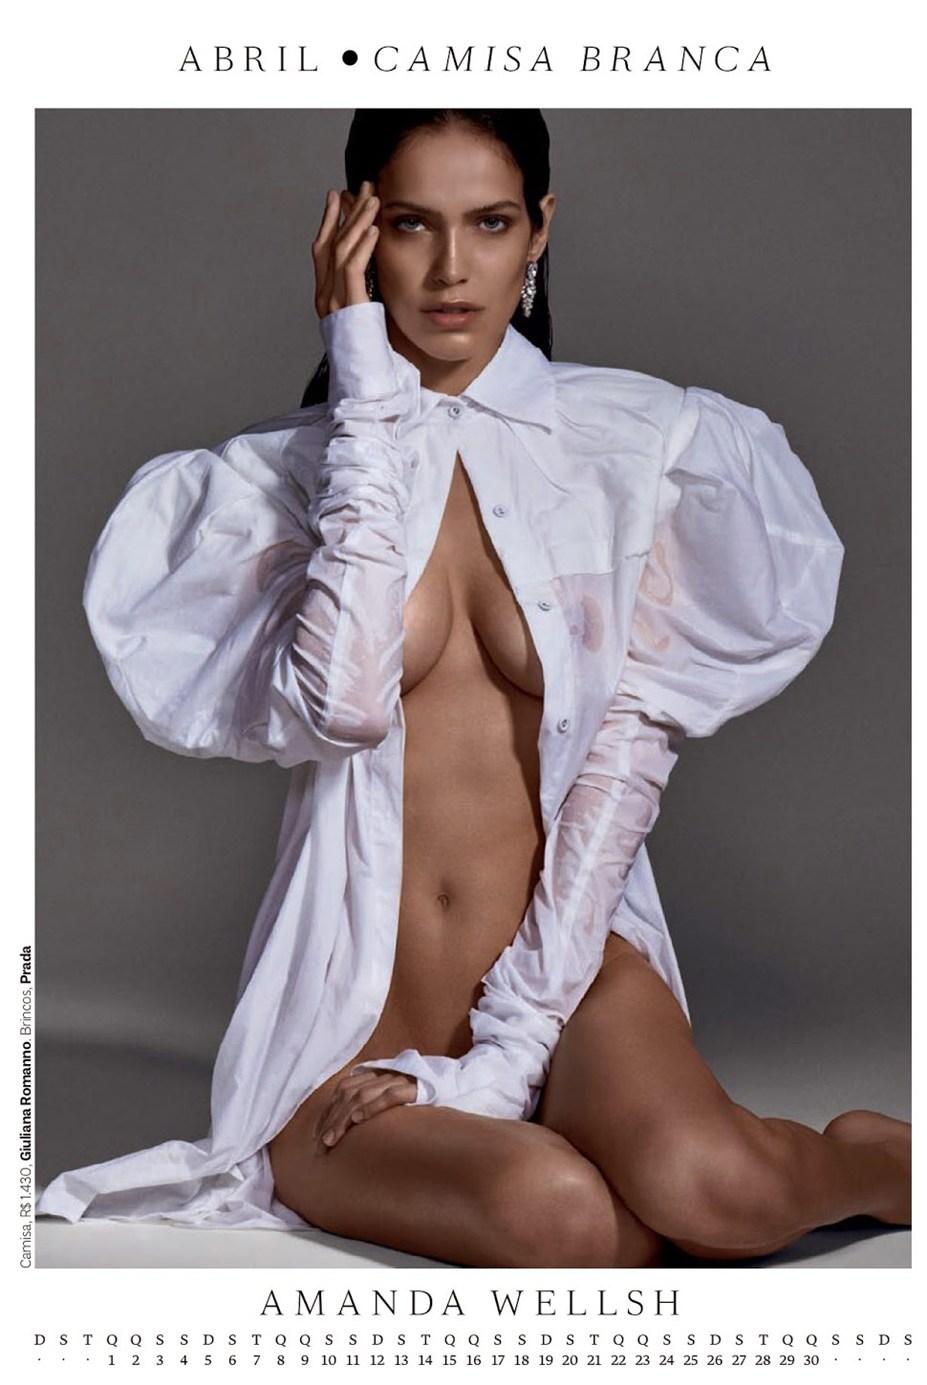 Календарь журнала Vogue Brazil 2015 / Calendar Girl by Zee Nunes - Amanda Wellsh / Аманда Уэллш